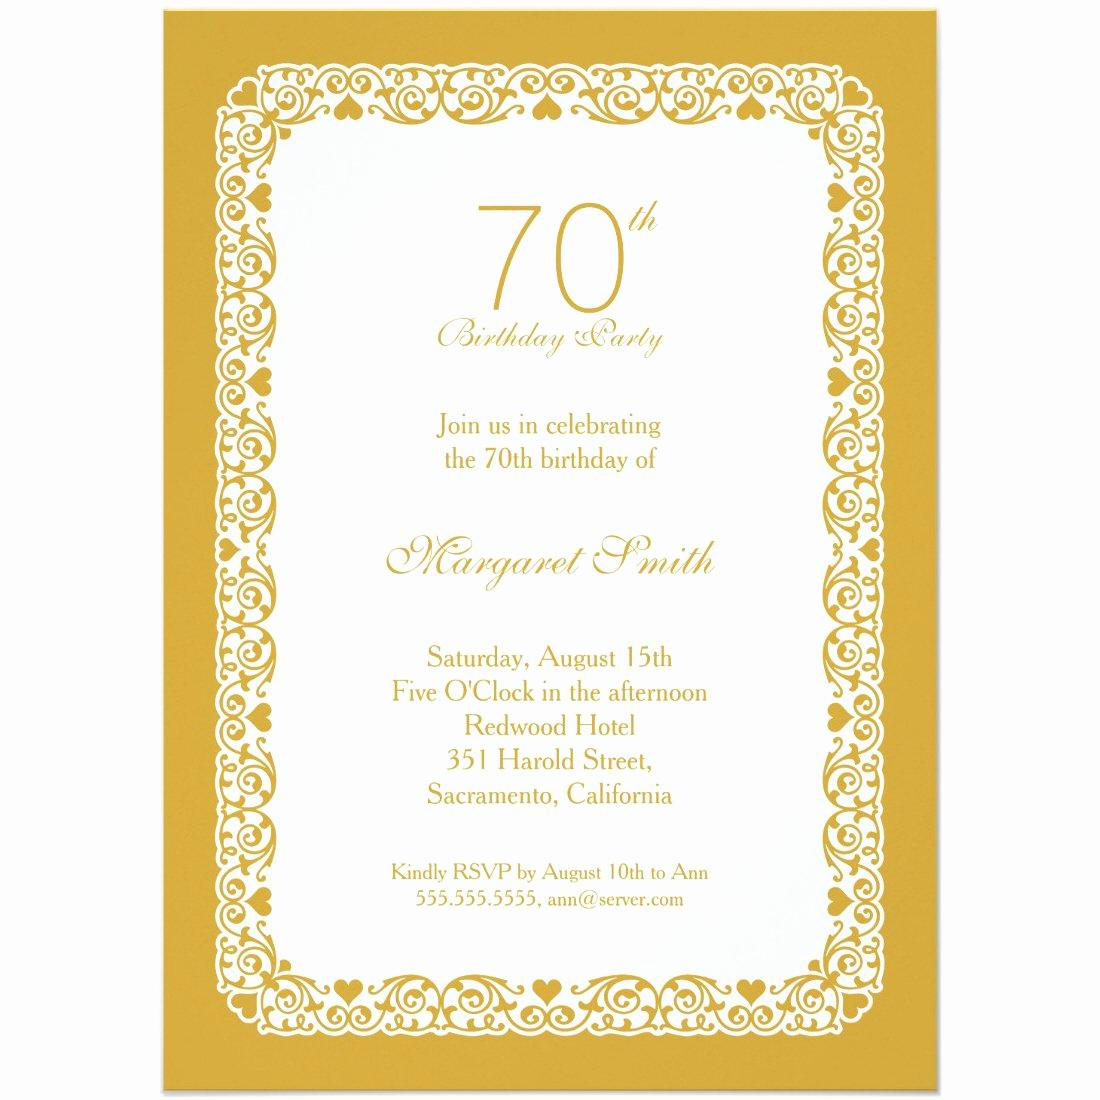 70th Birthday Invitation Ideas Awesome 70th Birthday Invitation Ideas